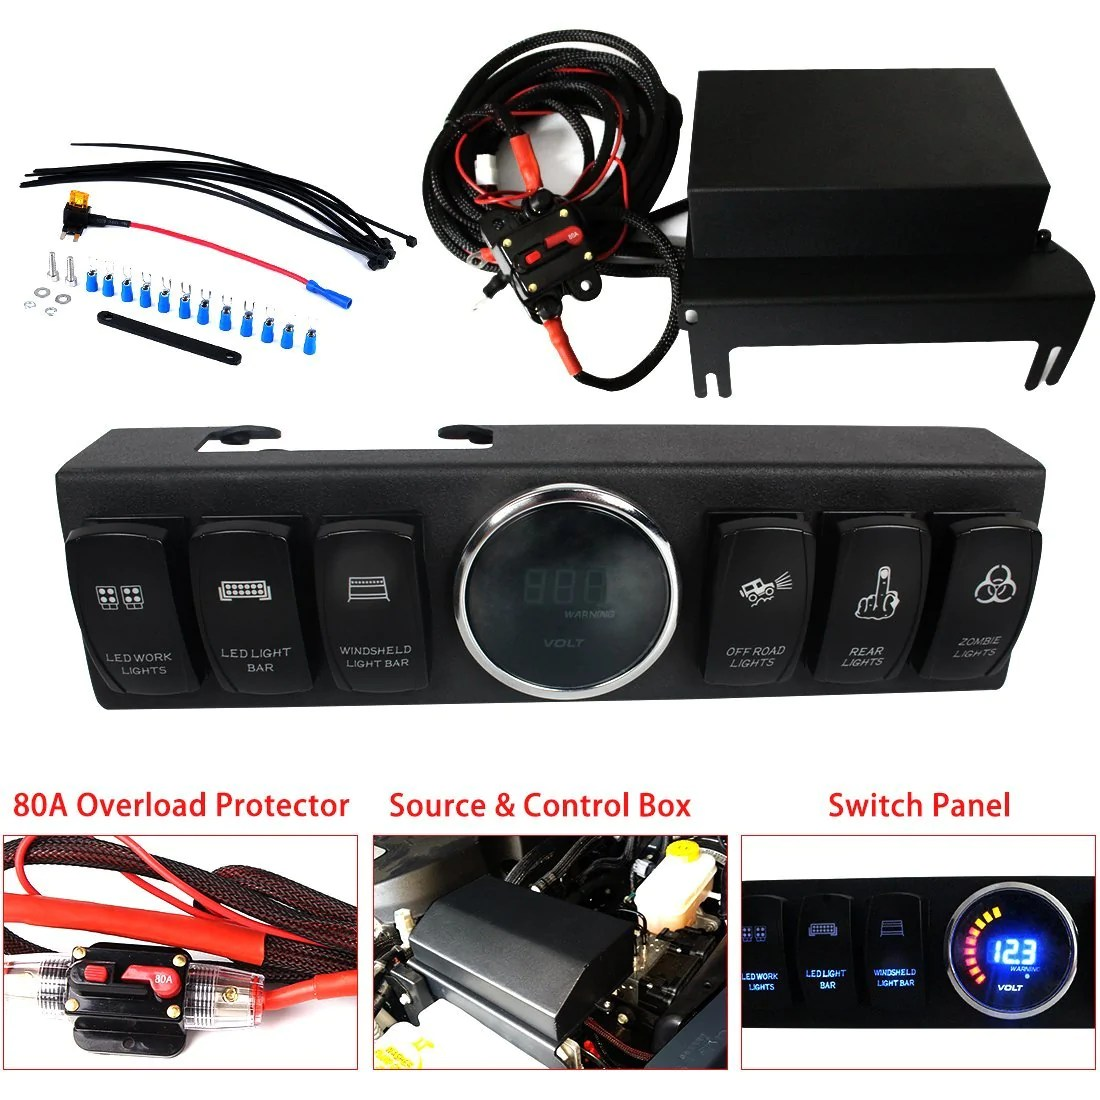 firebug 6 switch panel wiring kit for 07 16 jeep wrangler petrol version  [ 1100 x 1100 Pixel ]